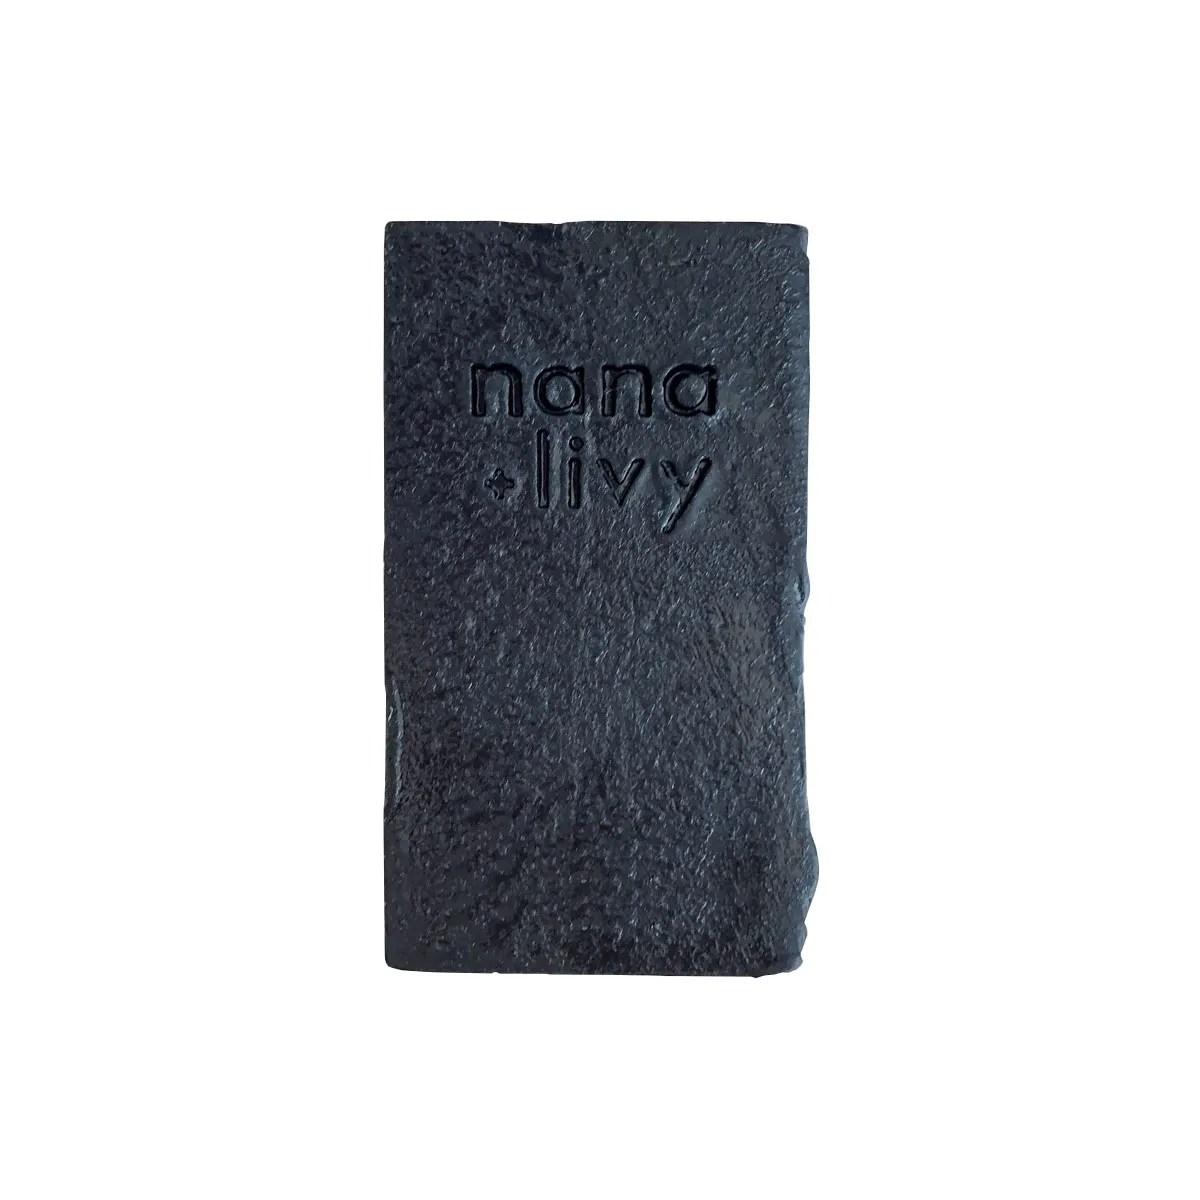 Charcoal Shampoo Bar